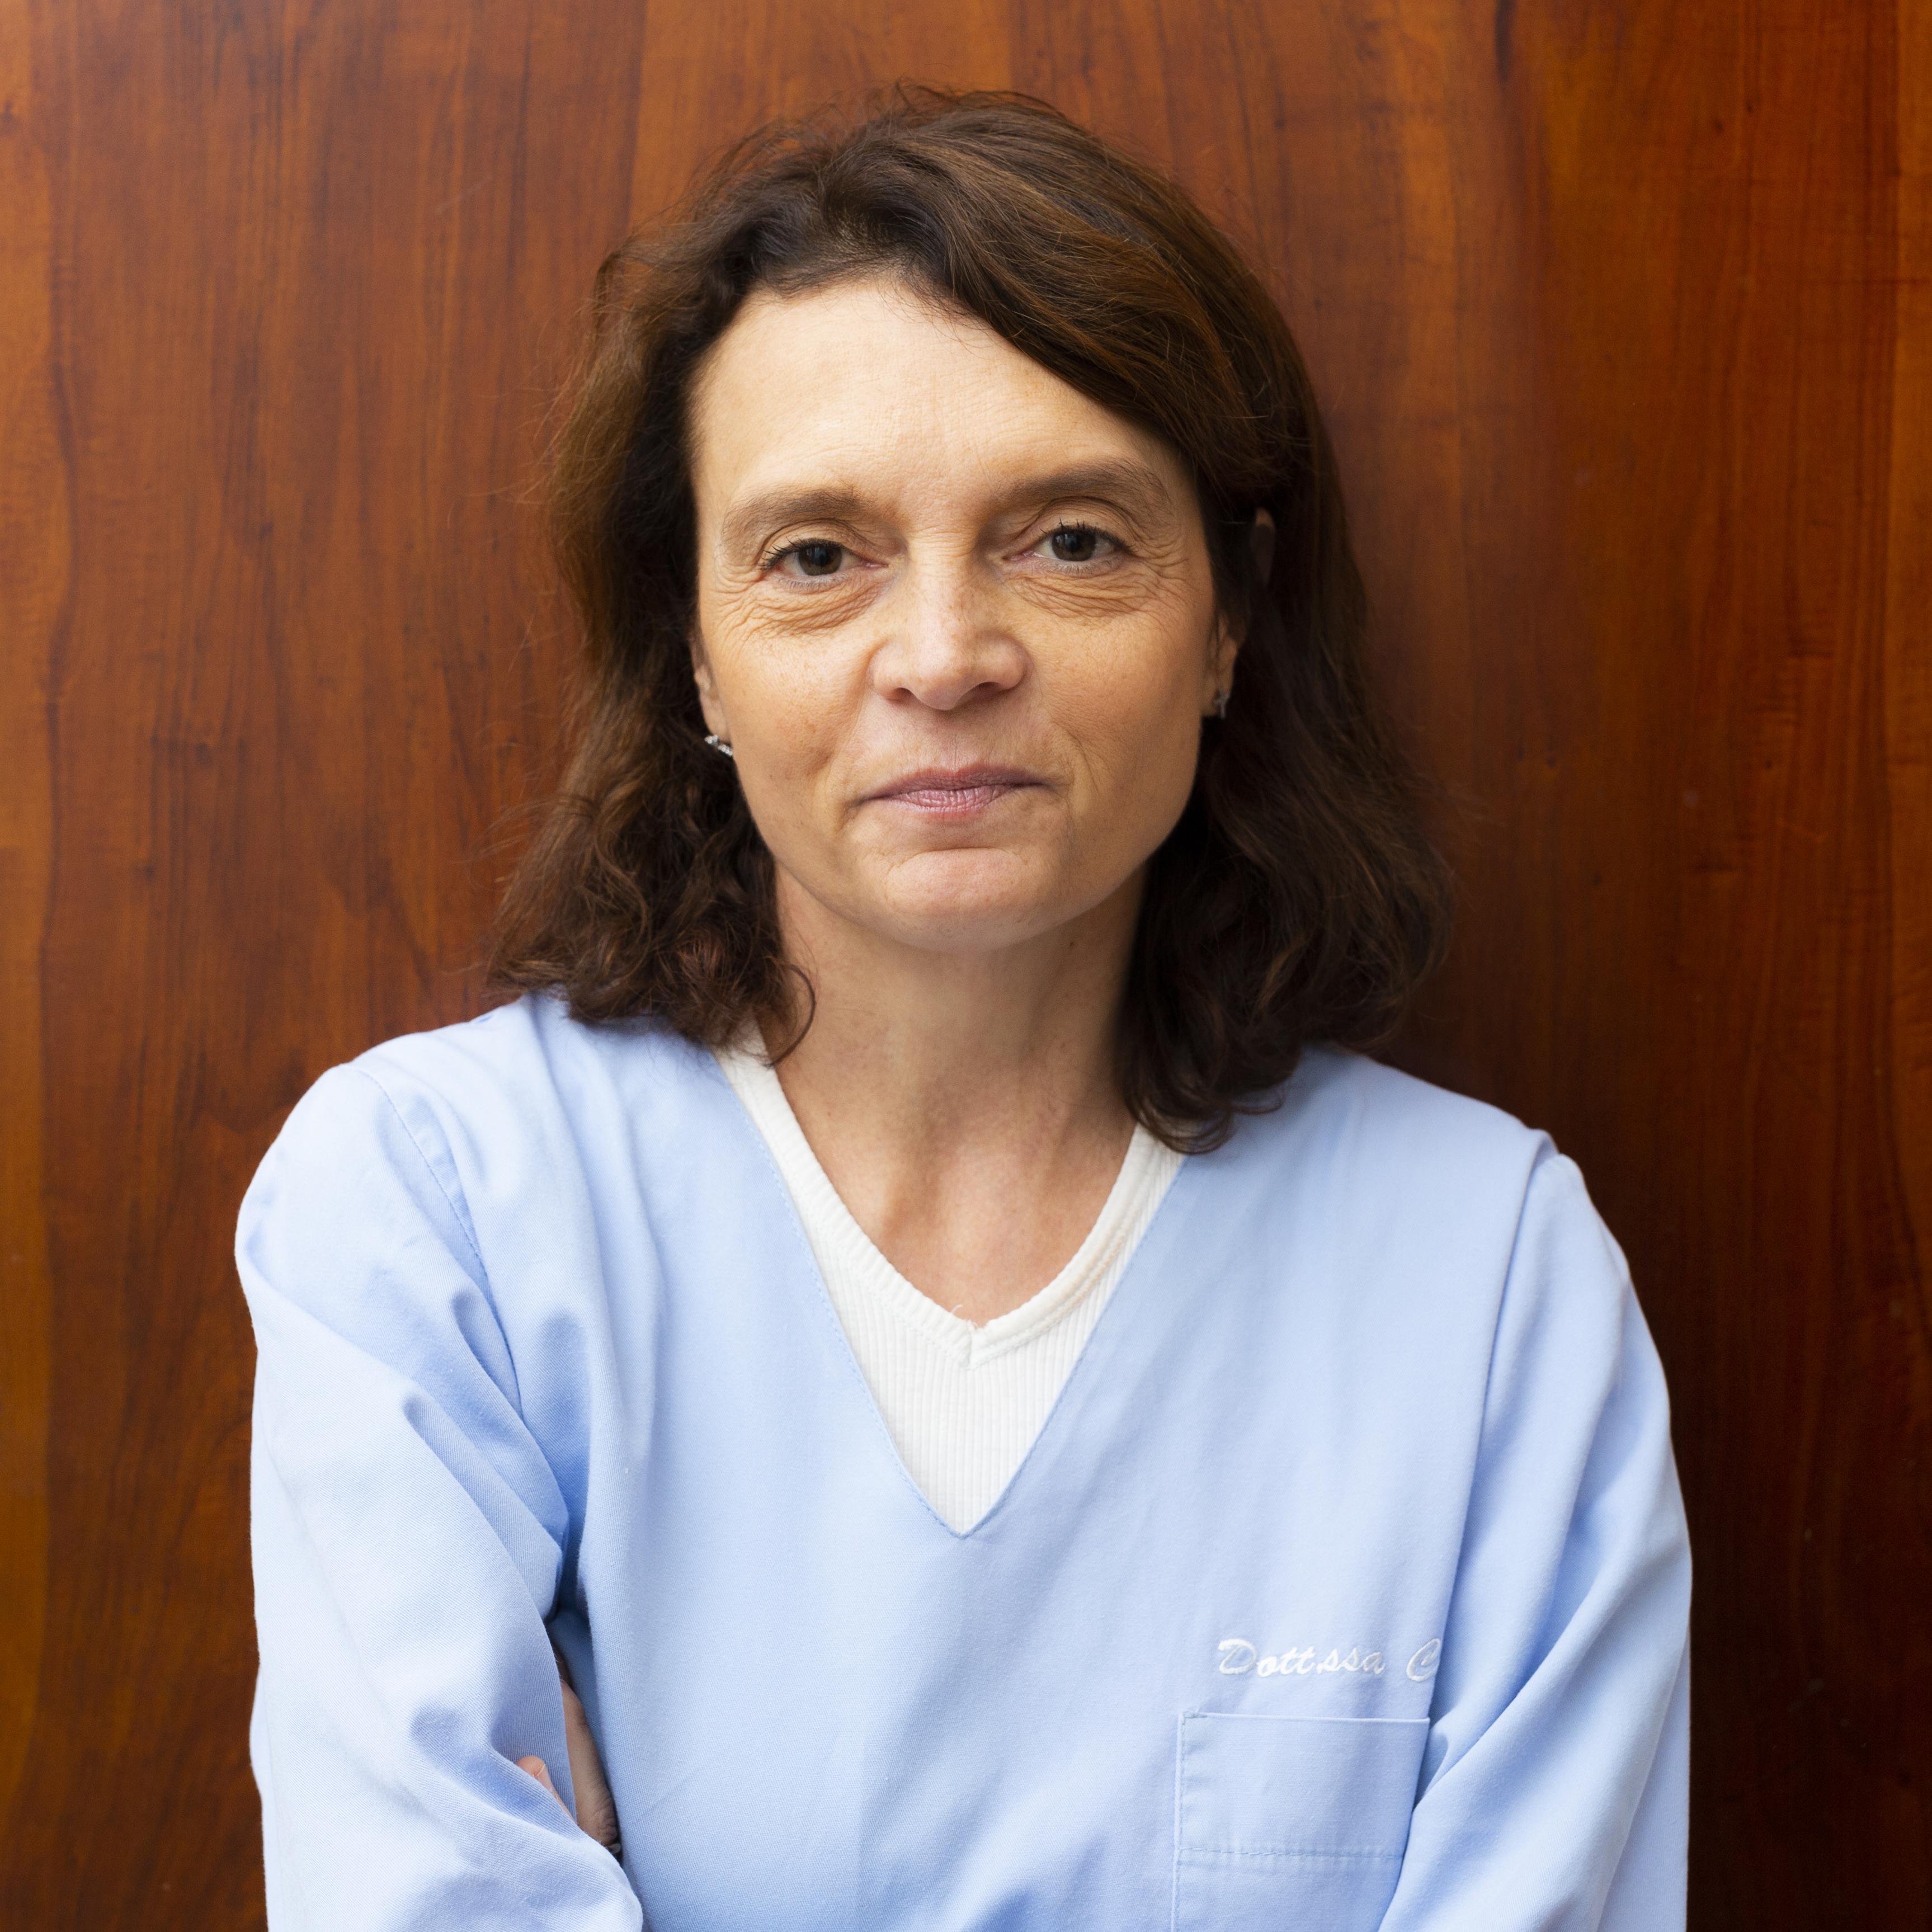 Dott.ssa Antonella Cavalieri